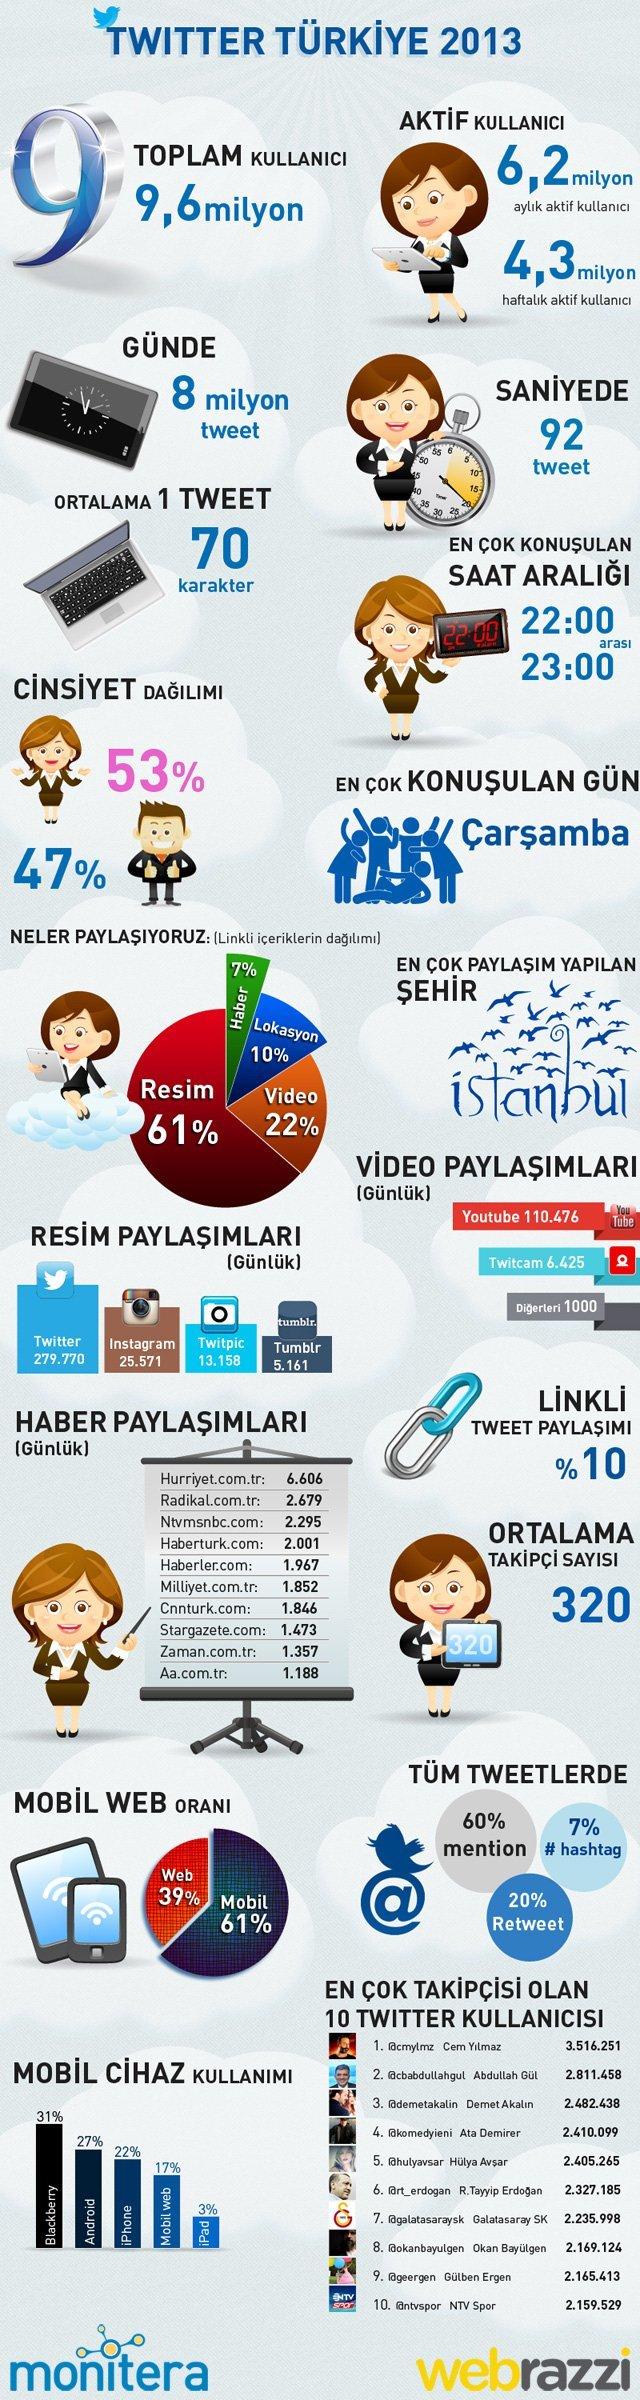 twitter-turkiye-2013-infografigi-640